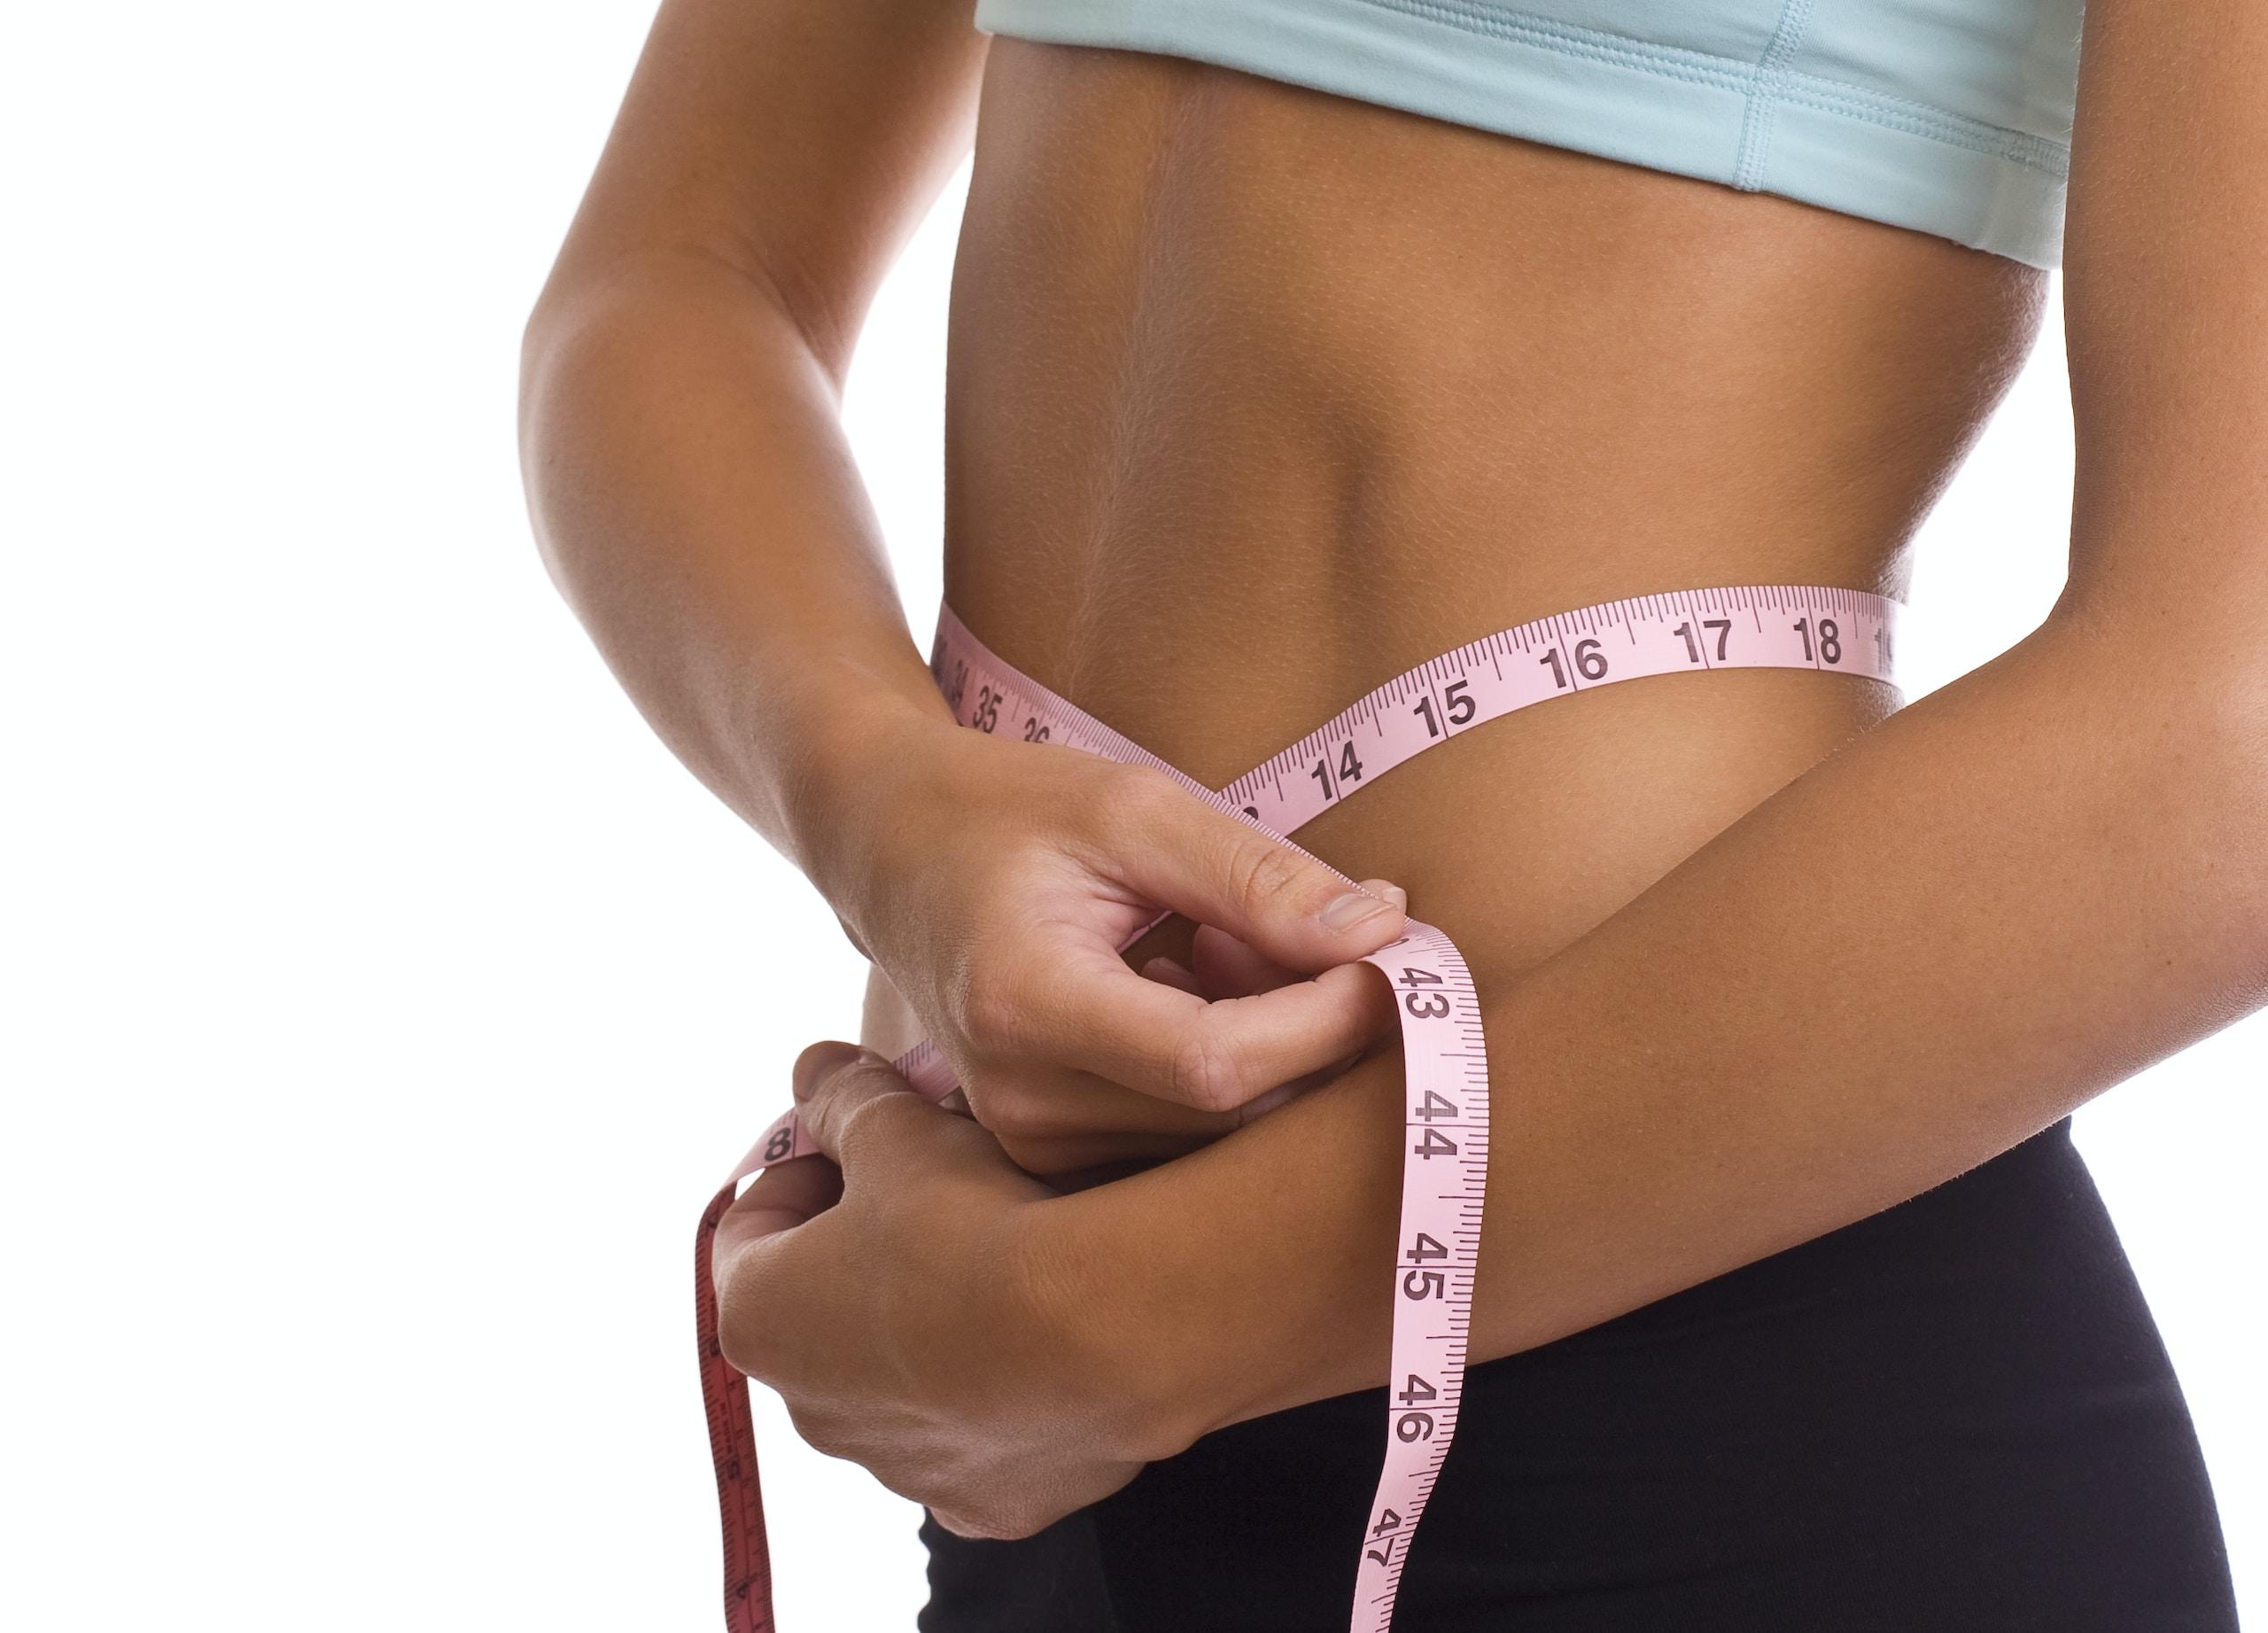 ayuno intermitente, woman using body tape measure while measuring her waist